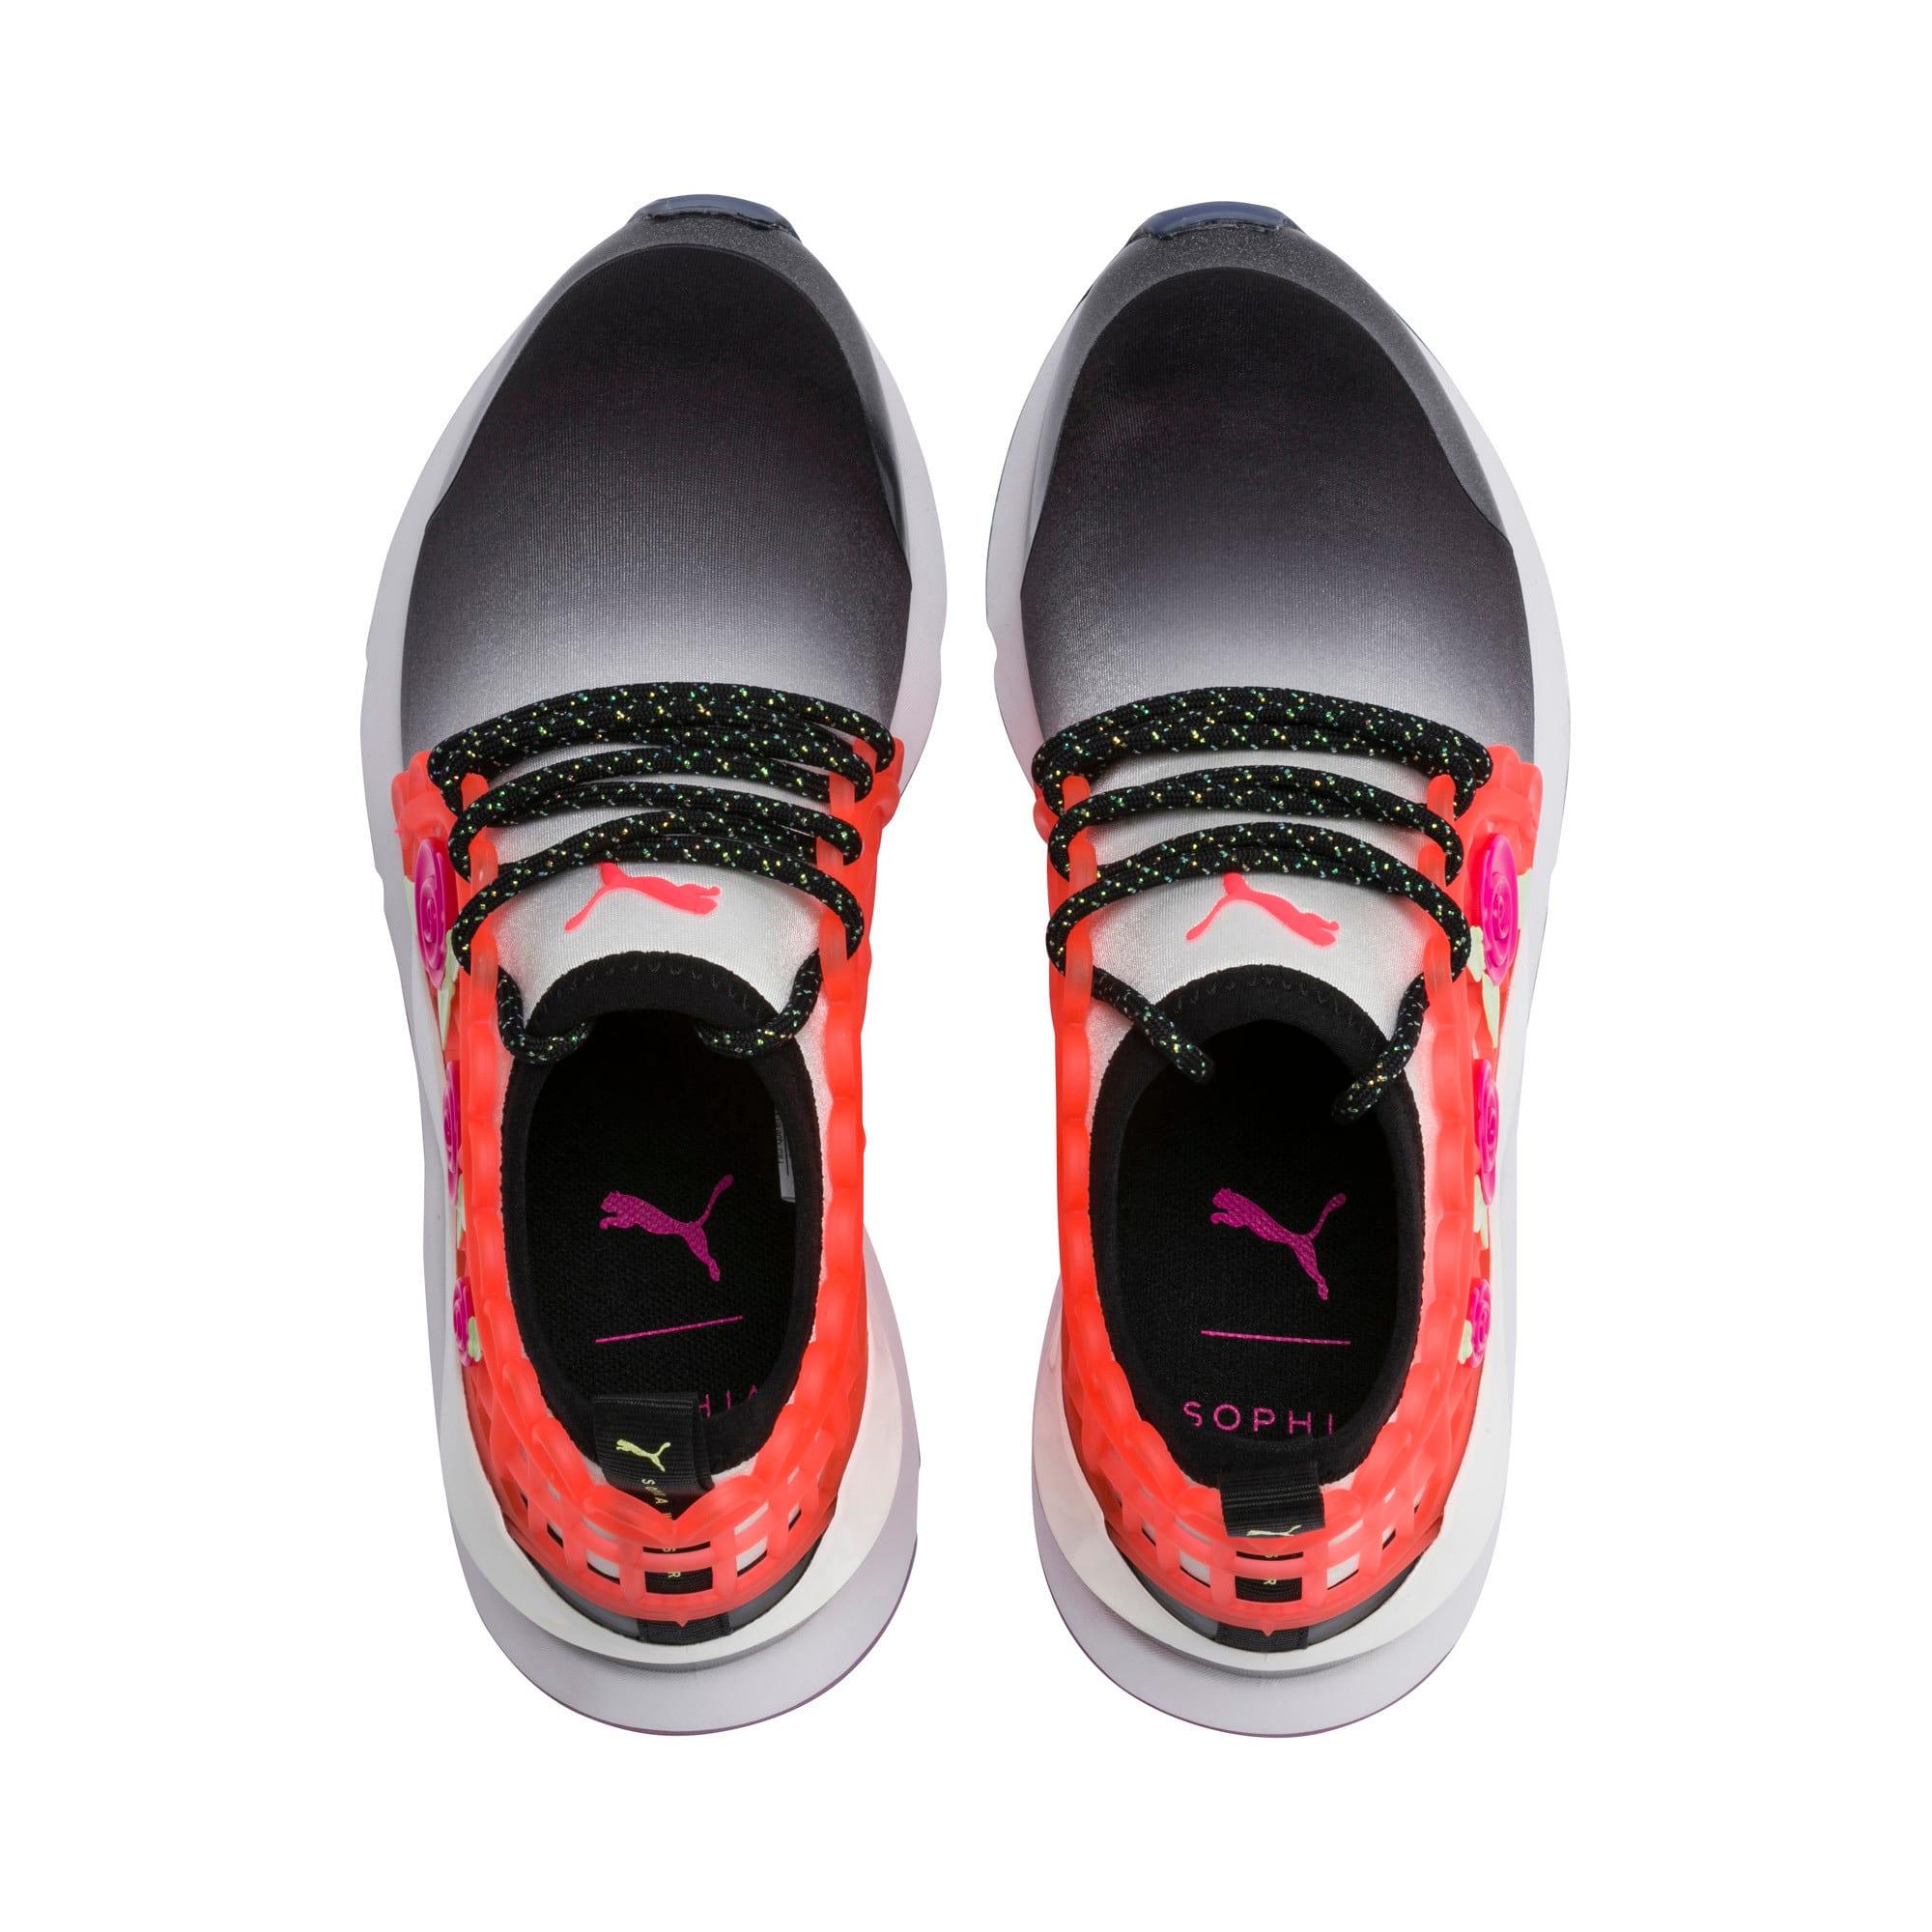 Thumbnail 6 of PUMA x SOPHIA WEBSTER Muse Women's Sneakers, Puma Black-Puma White, medium